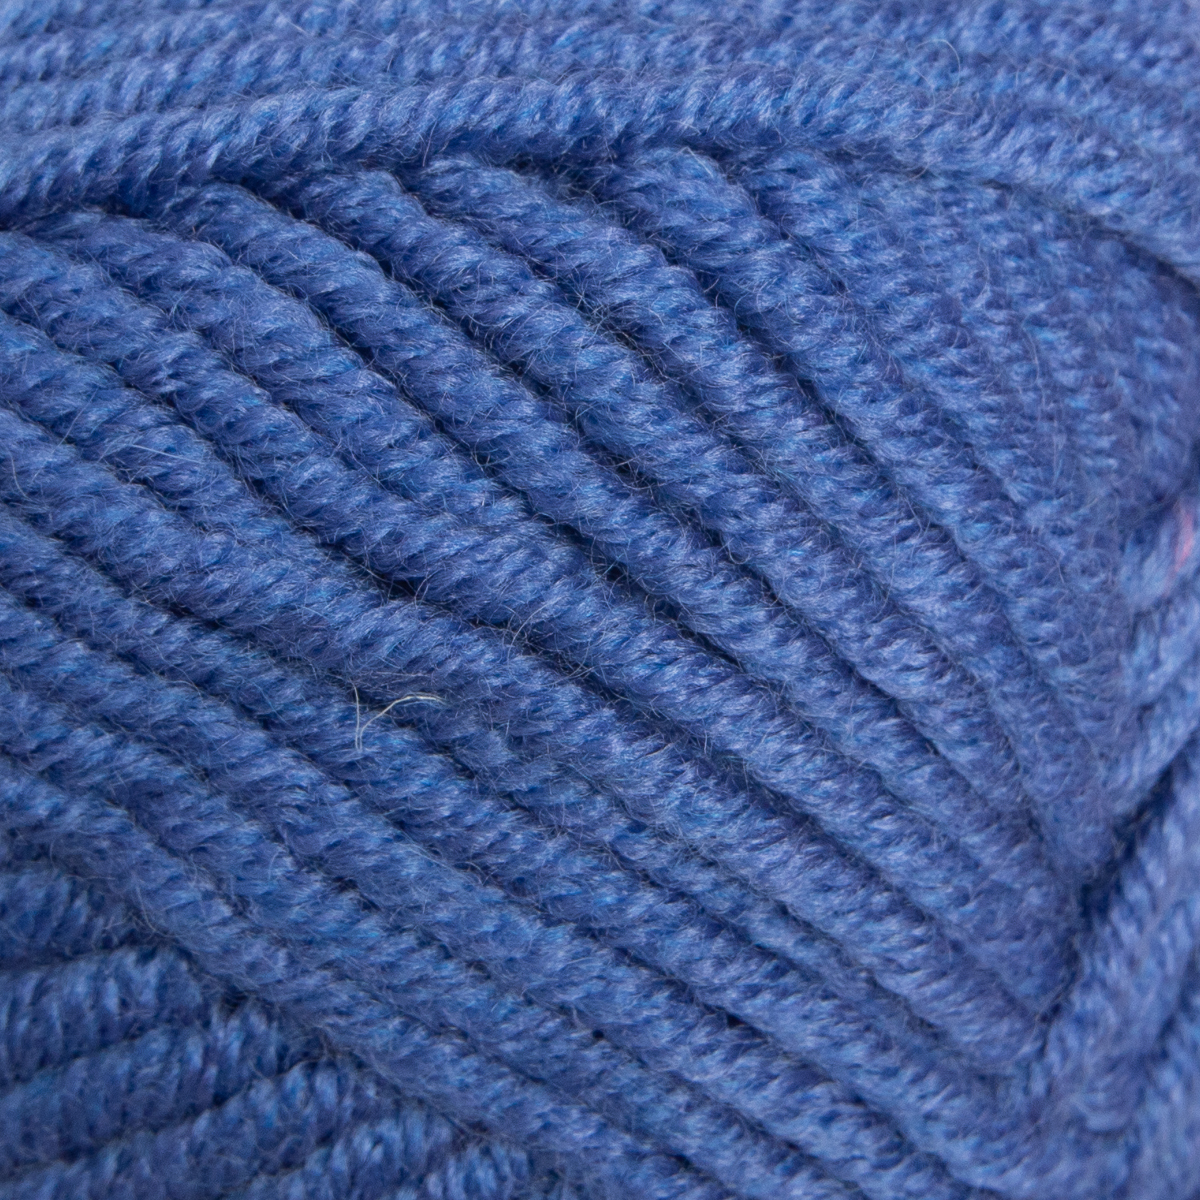 3pk-Lion-Brand-Woolspun-Acrylic-amp-Wool-Yarn-Bulky-5-Knit-Crocheting-Skeins-Soft thumbnail 67